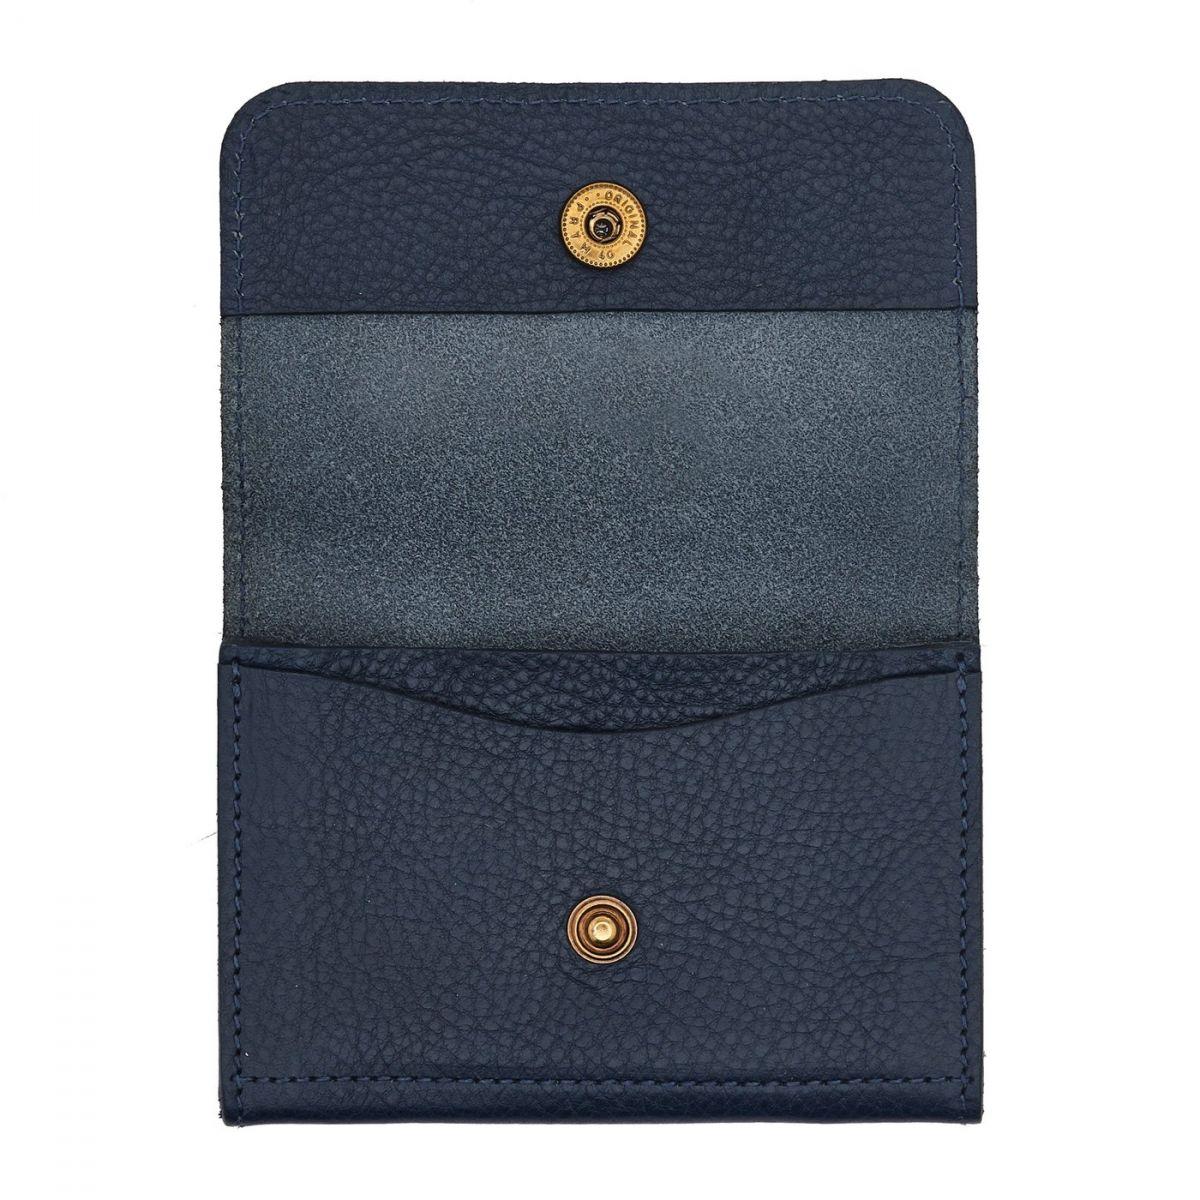 Porta Carte Piccolino in Pelle Di Vacchetta SCC006 colore Blu | Details